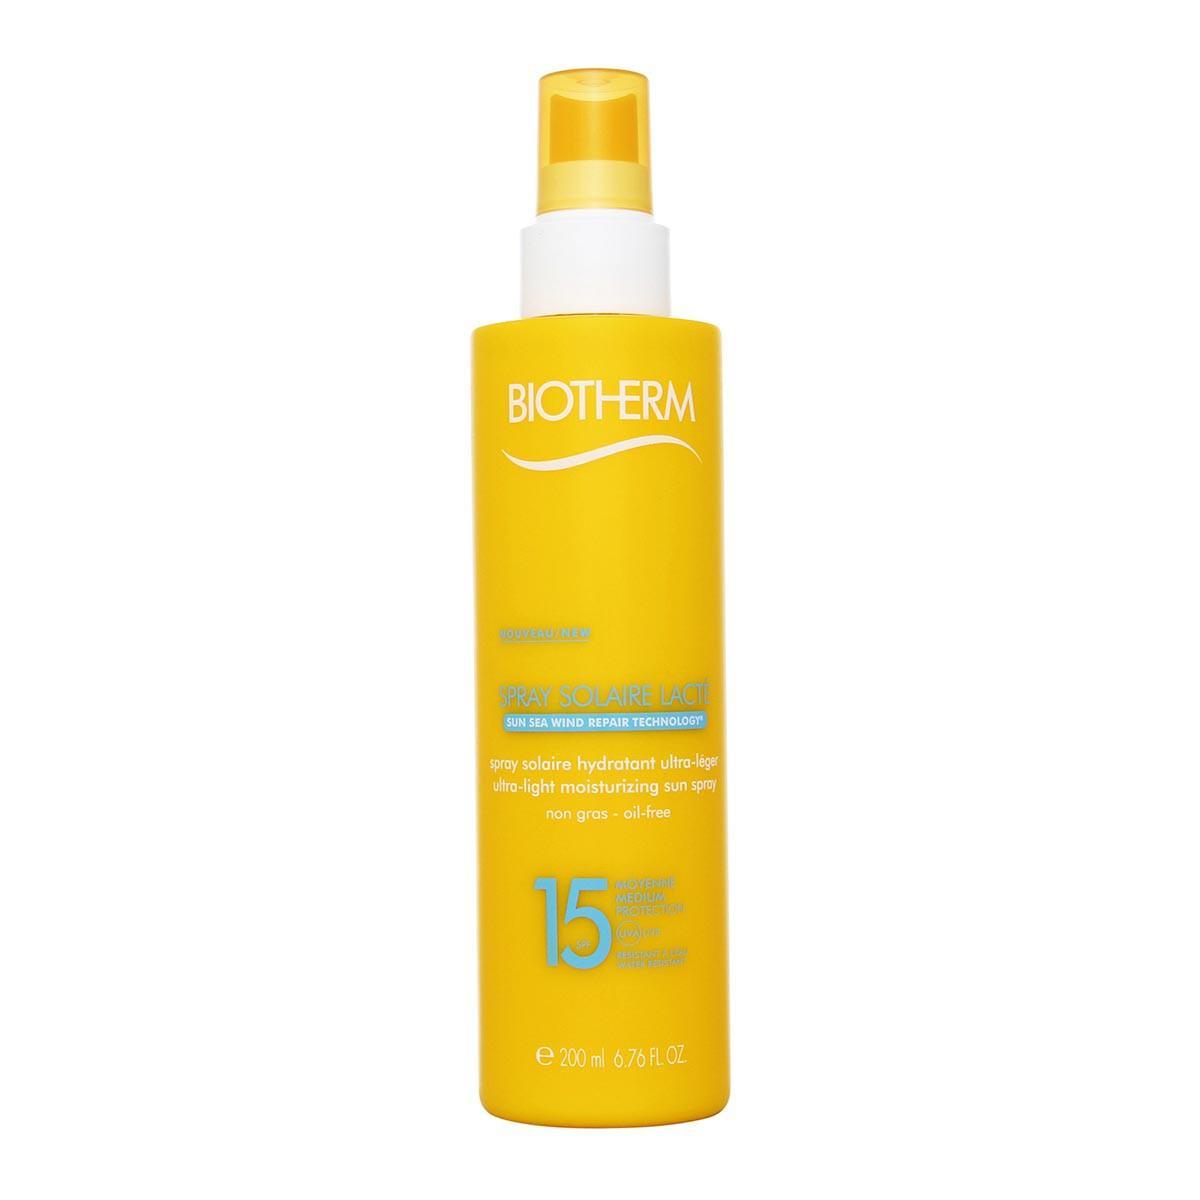 Biotherm-fragrances Spray Solaire Lacte Spf15 200ml